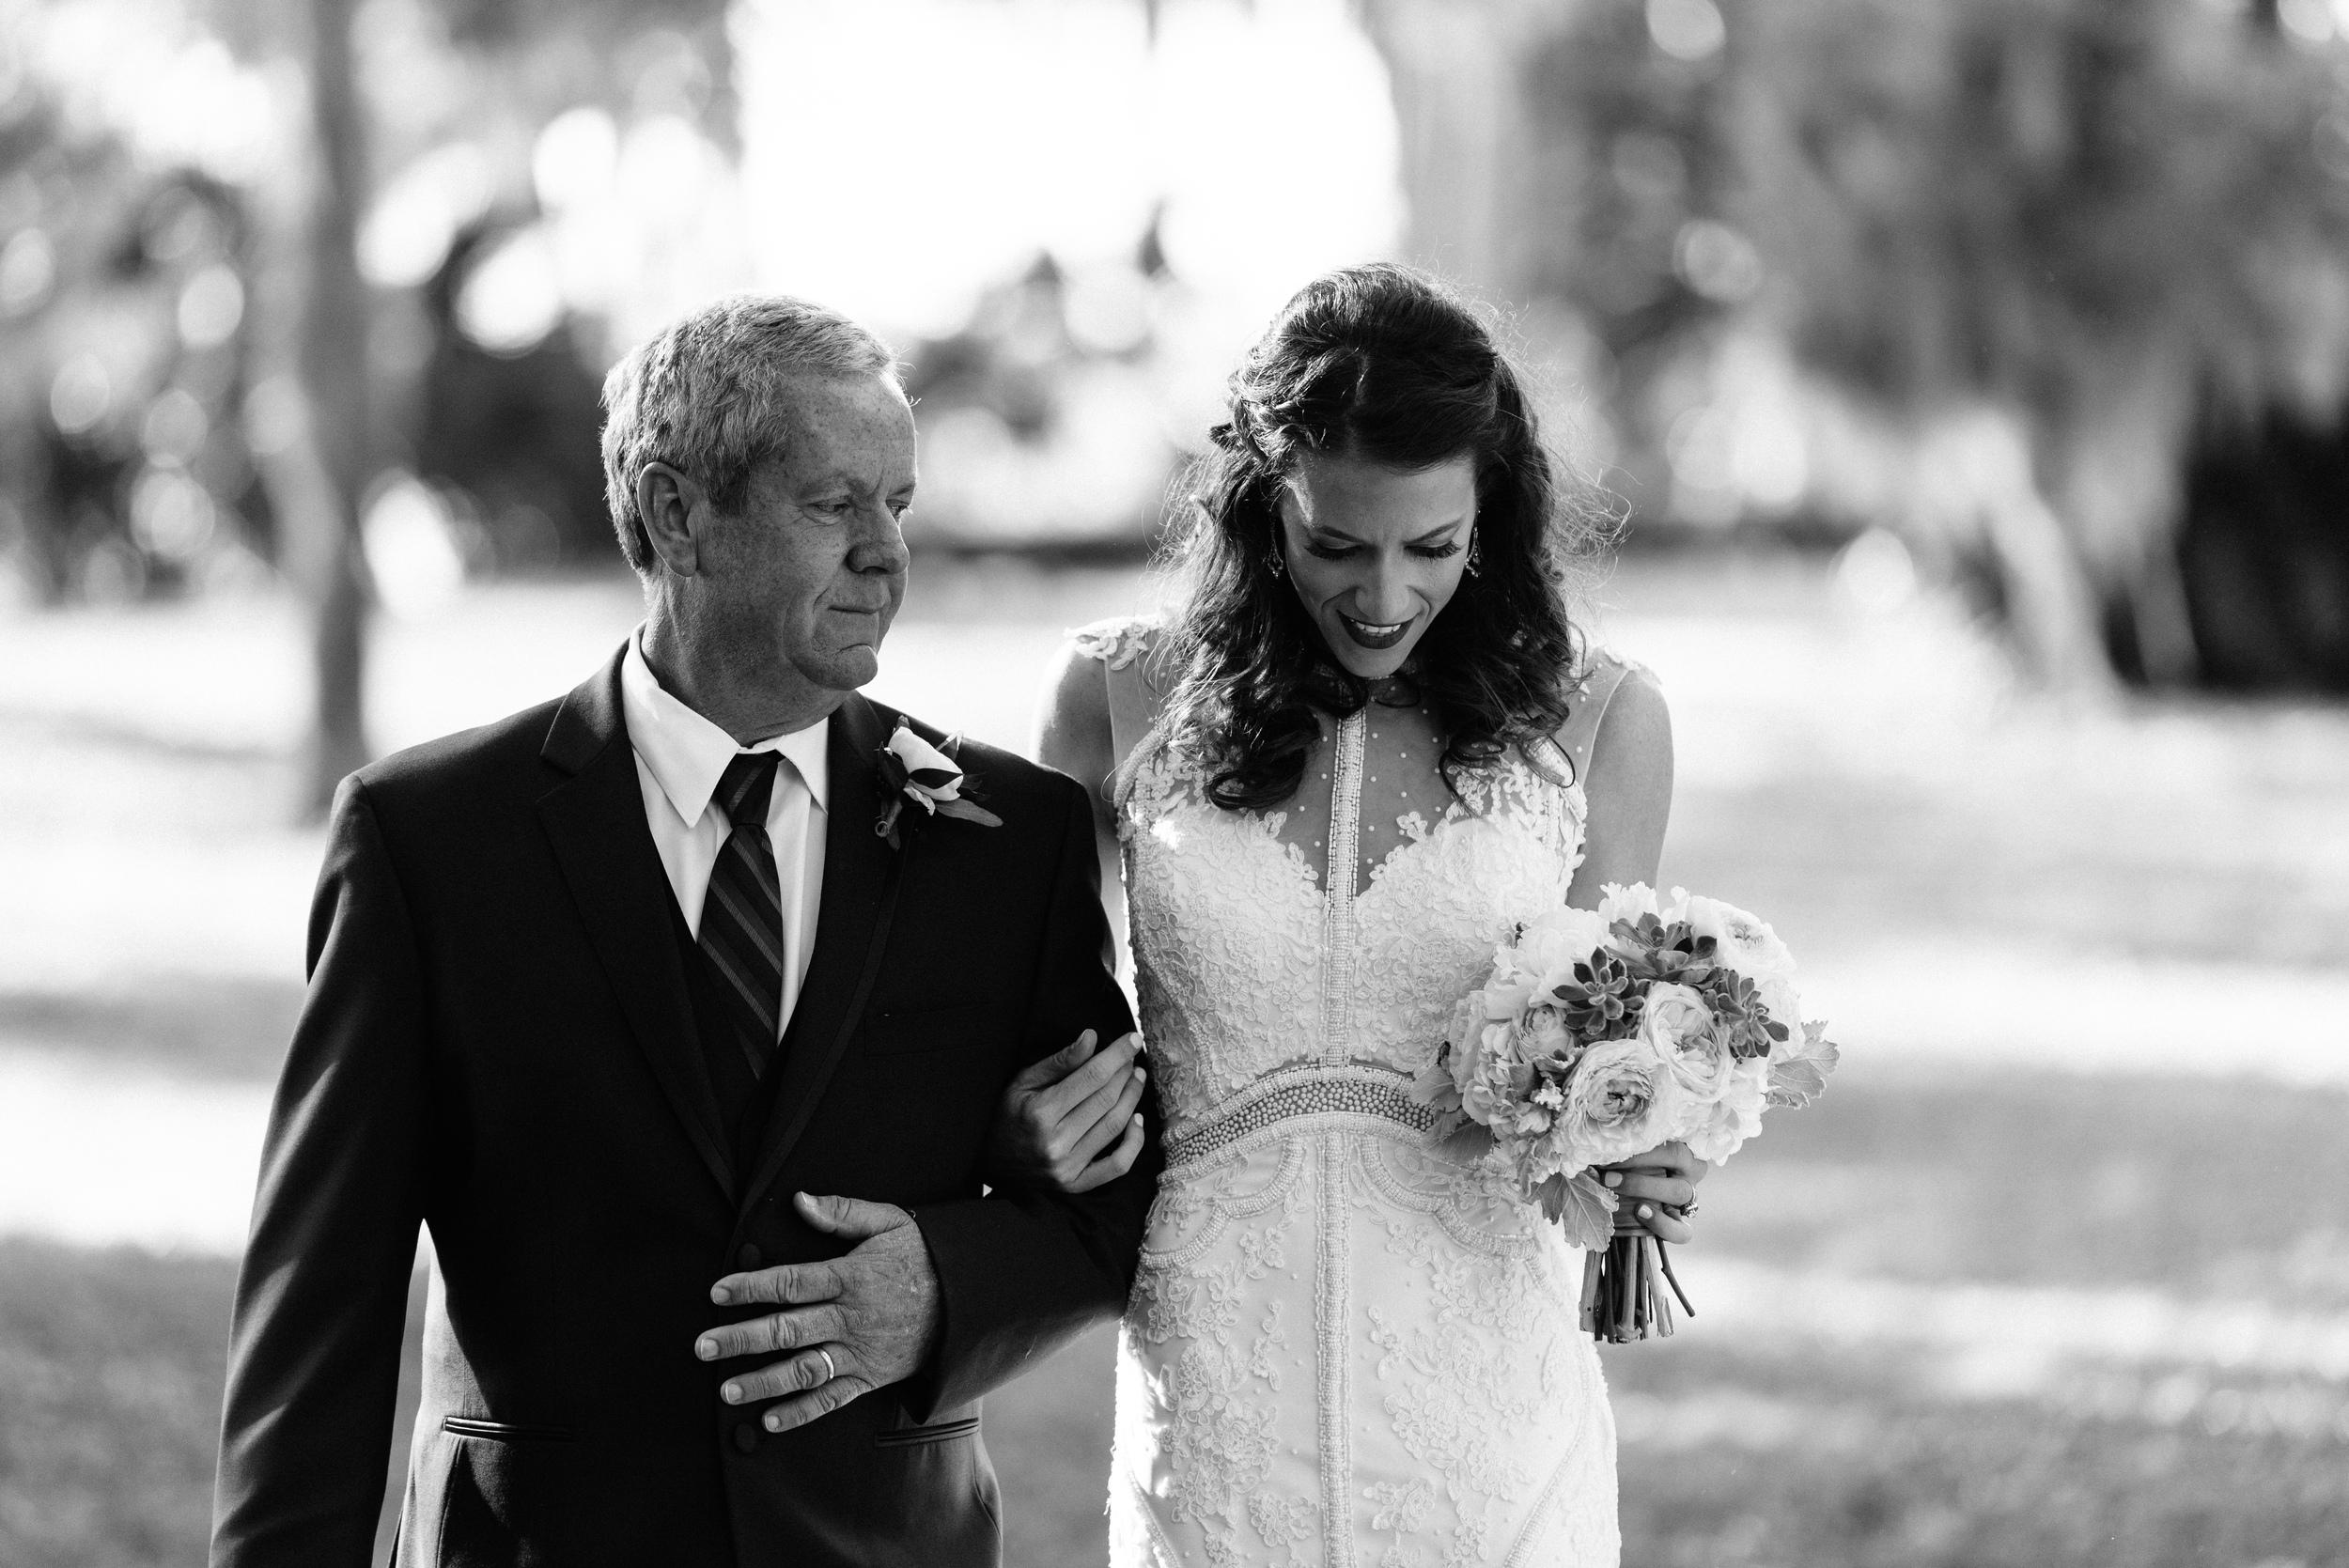 kadi-and-matt-carroll-april-9-2016-jekyl-island-wedding-m-newsom-photography- (202 of 484).jpg